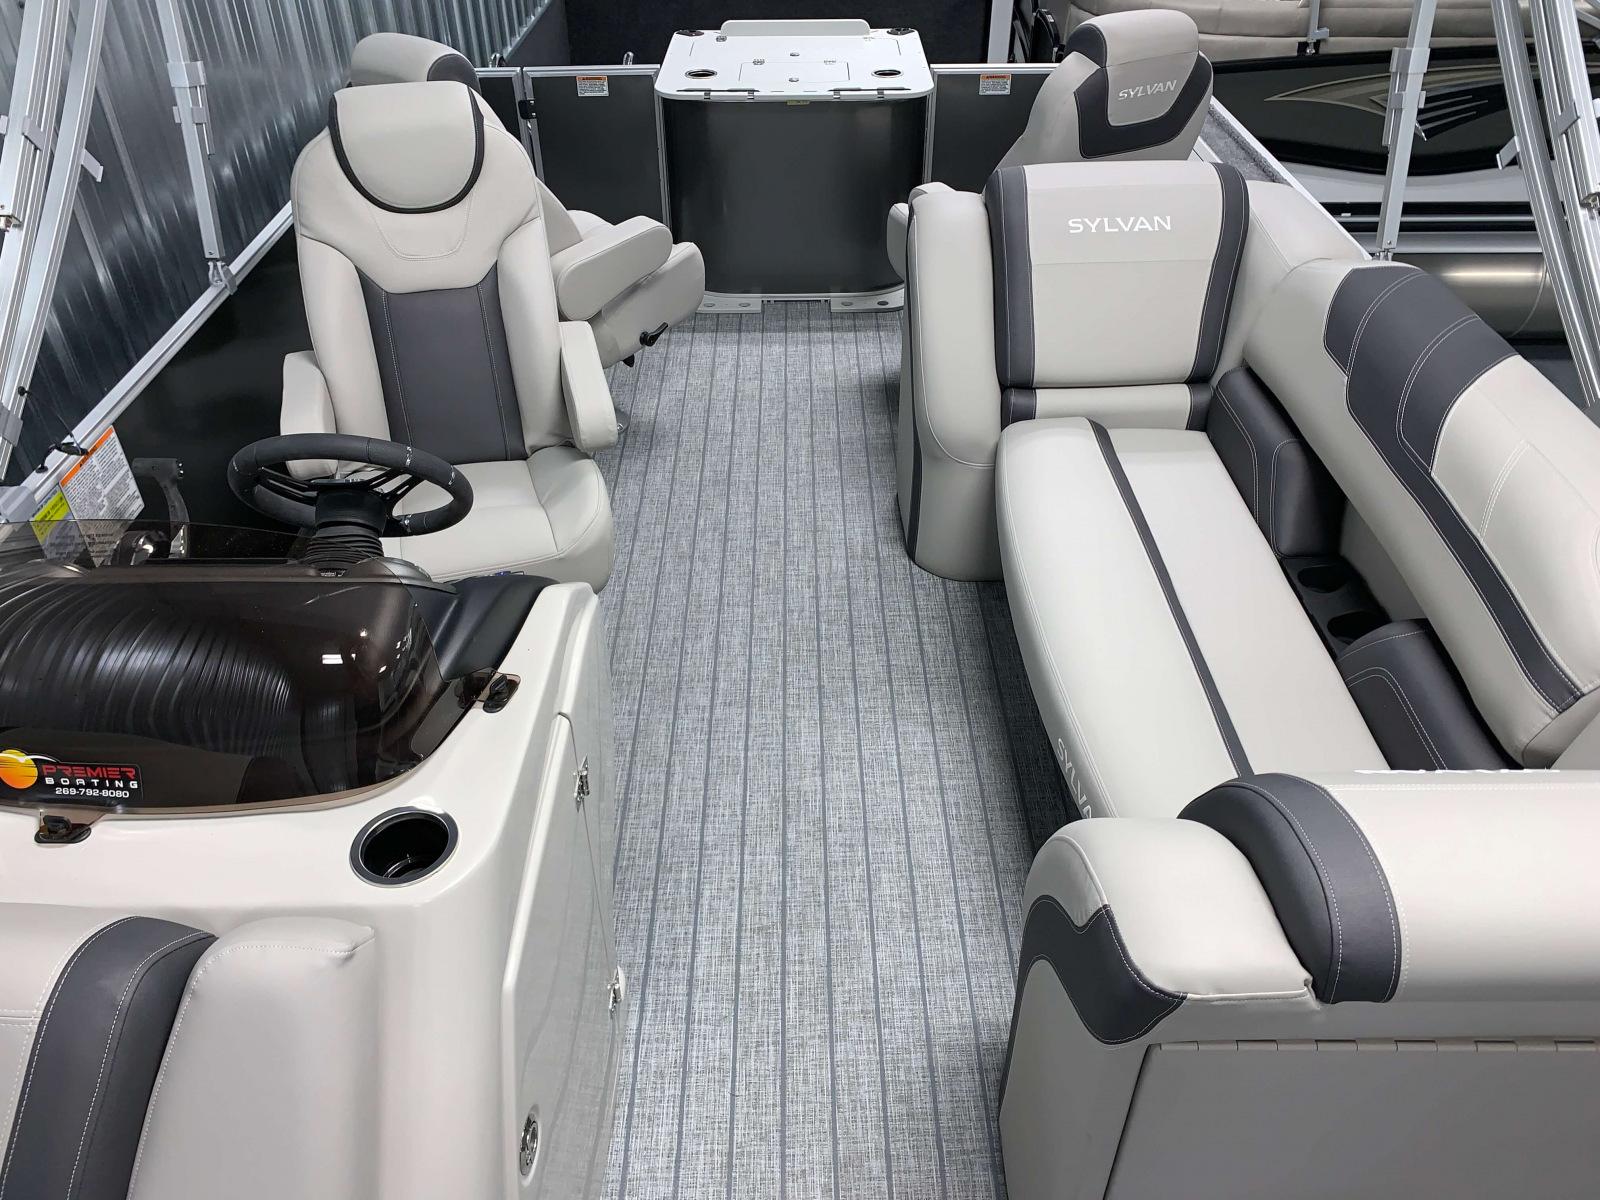 Interior Aft Layout of the 2022 Sylvan L3 Party Fish Pontoon Boat